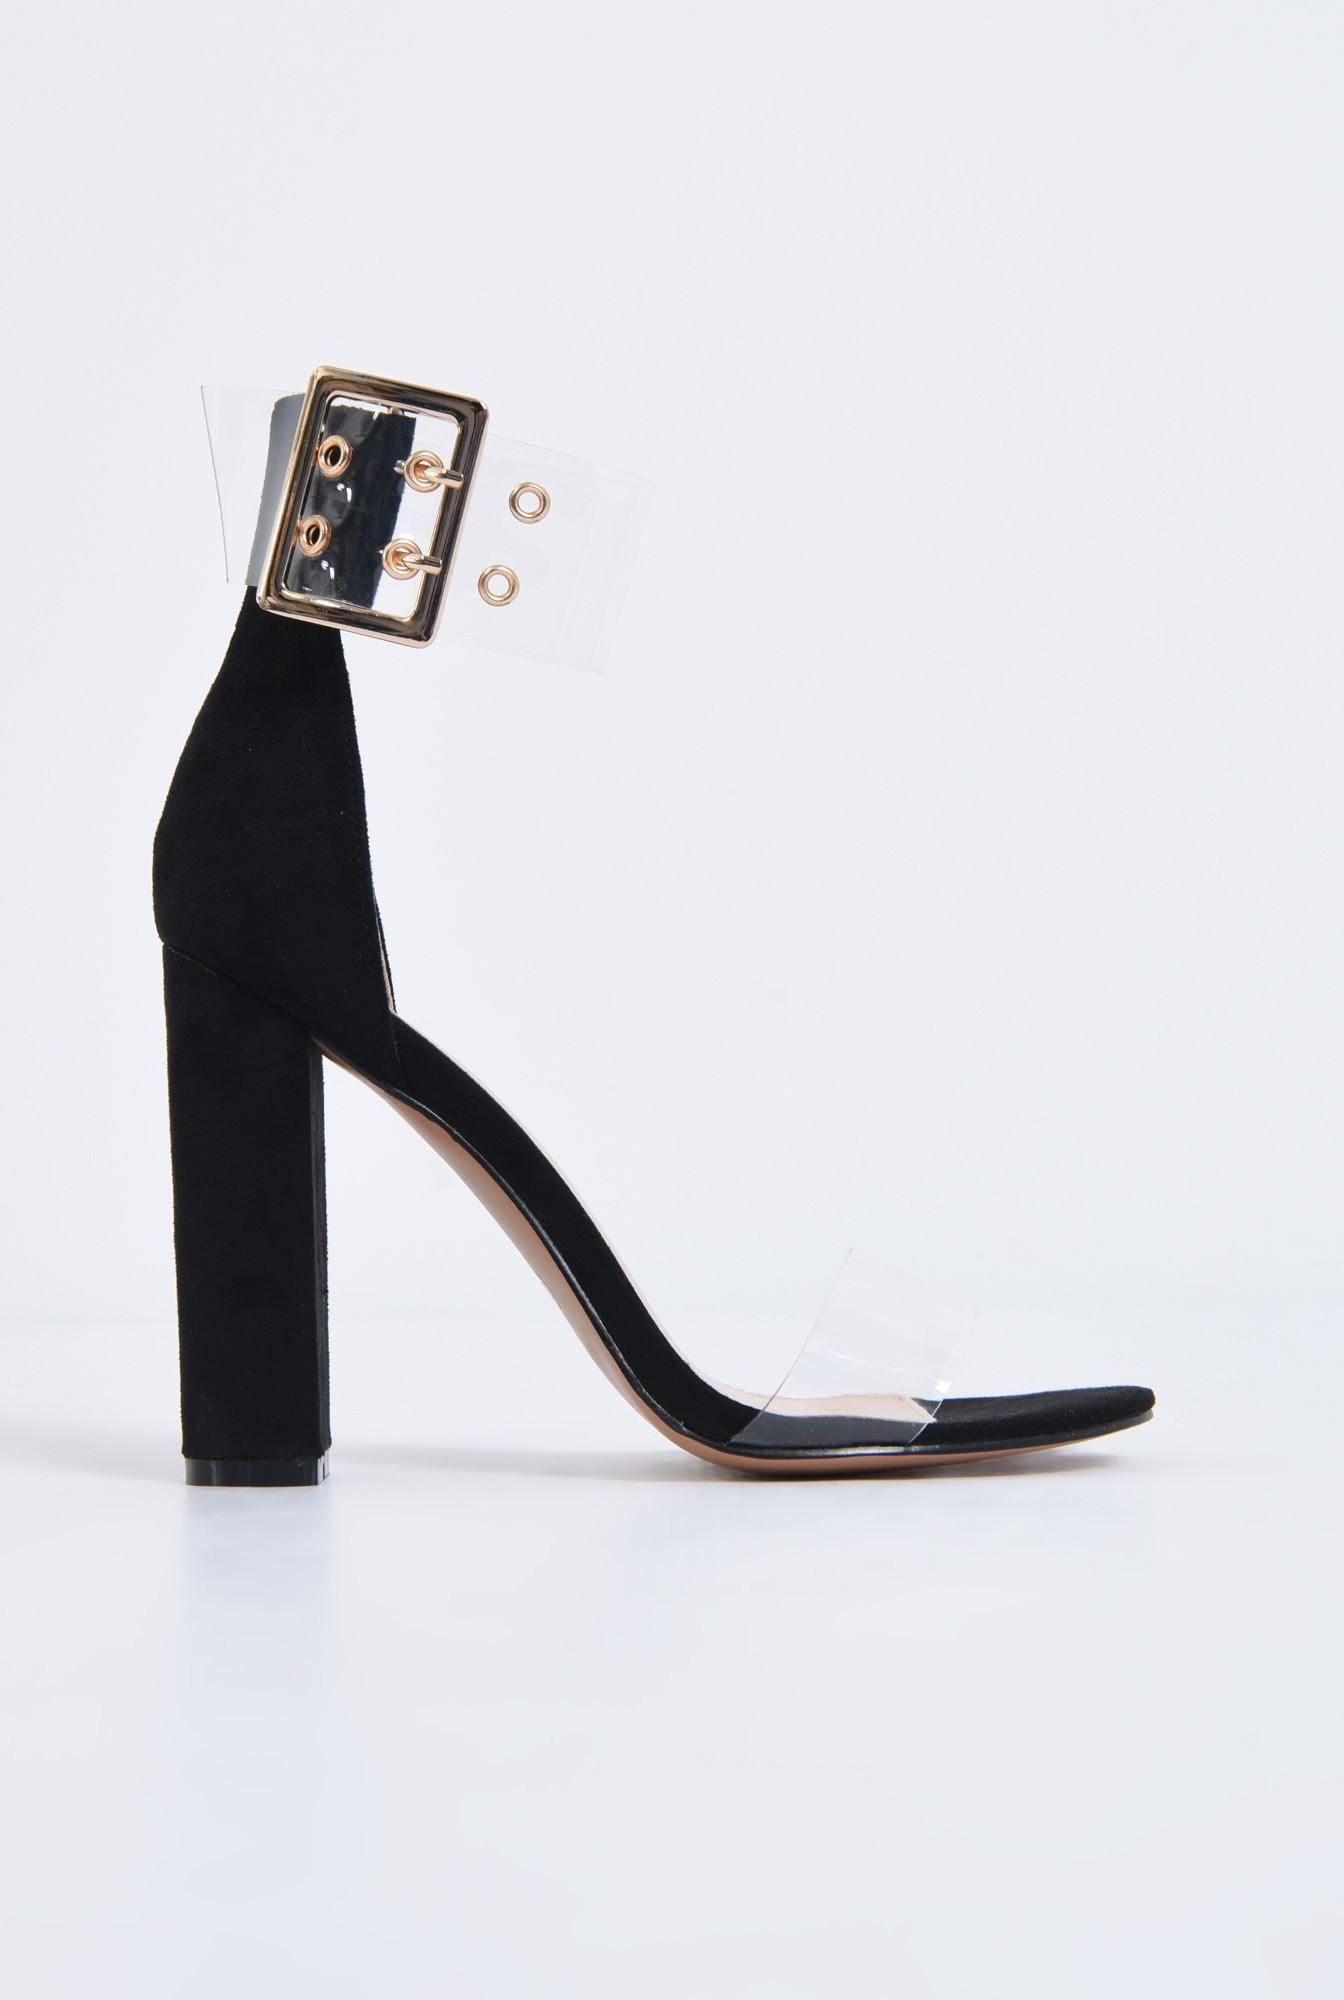 0 - sandale dama, toc gros, capse, auriu